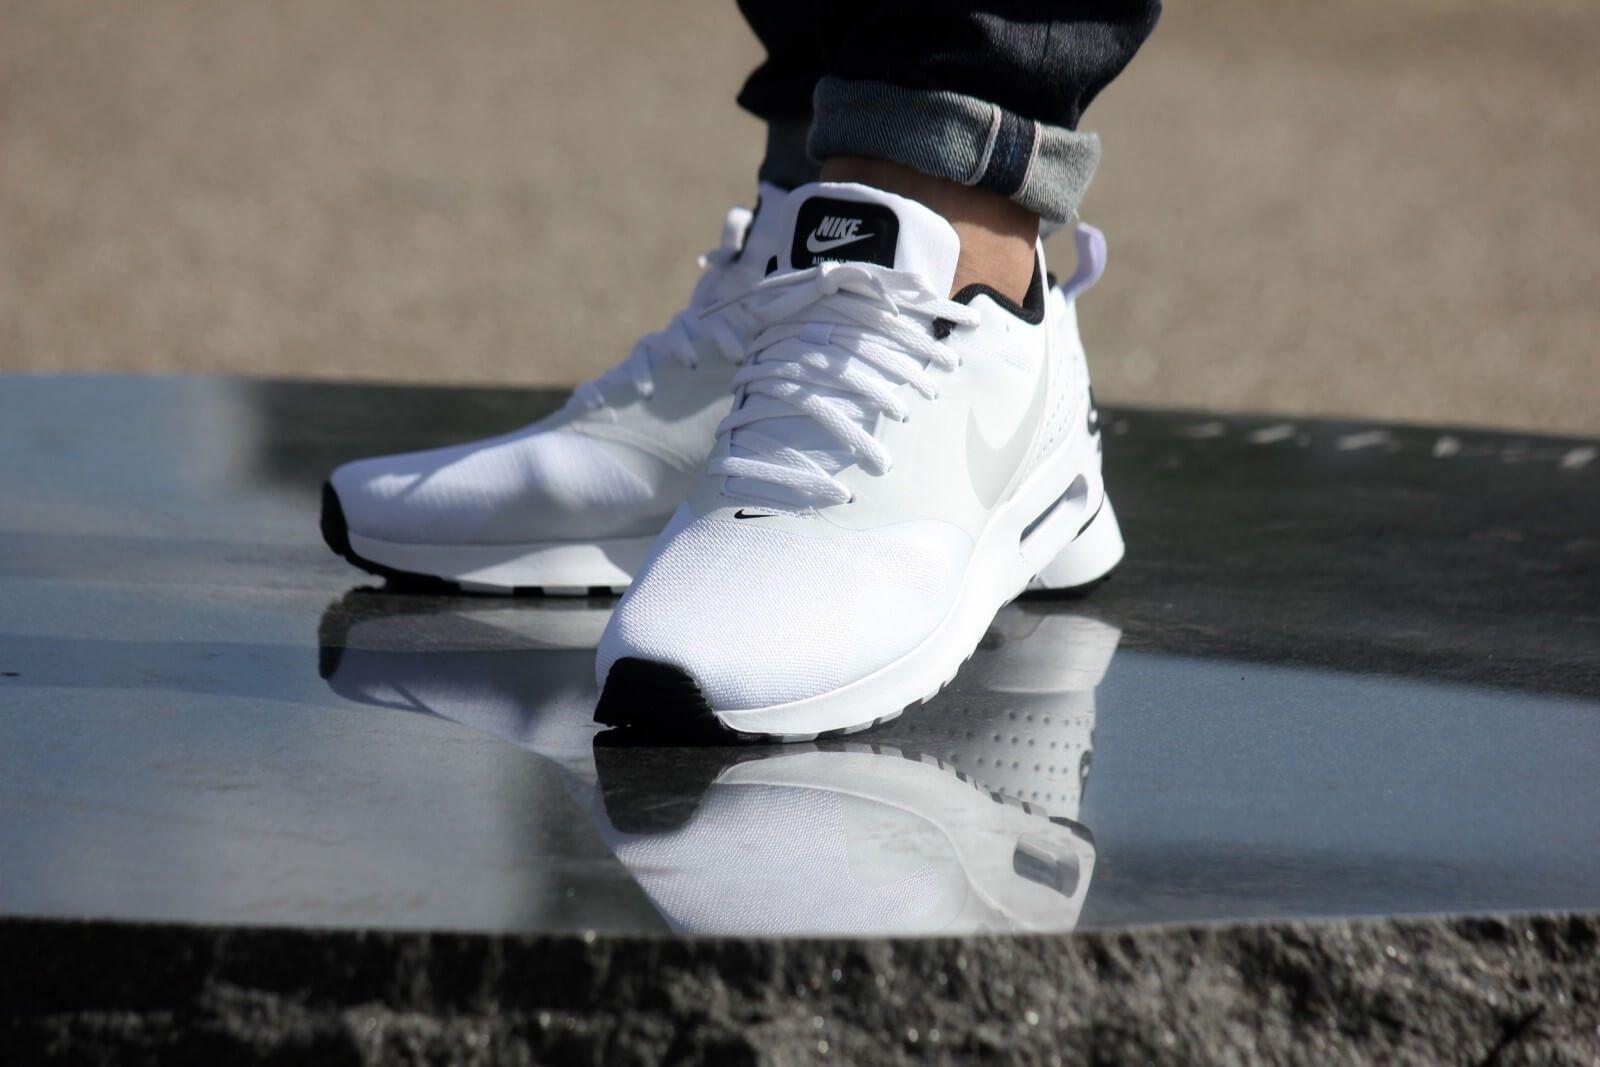 Nike Air Max Tavas White, Pure Platinum